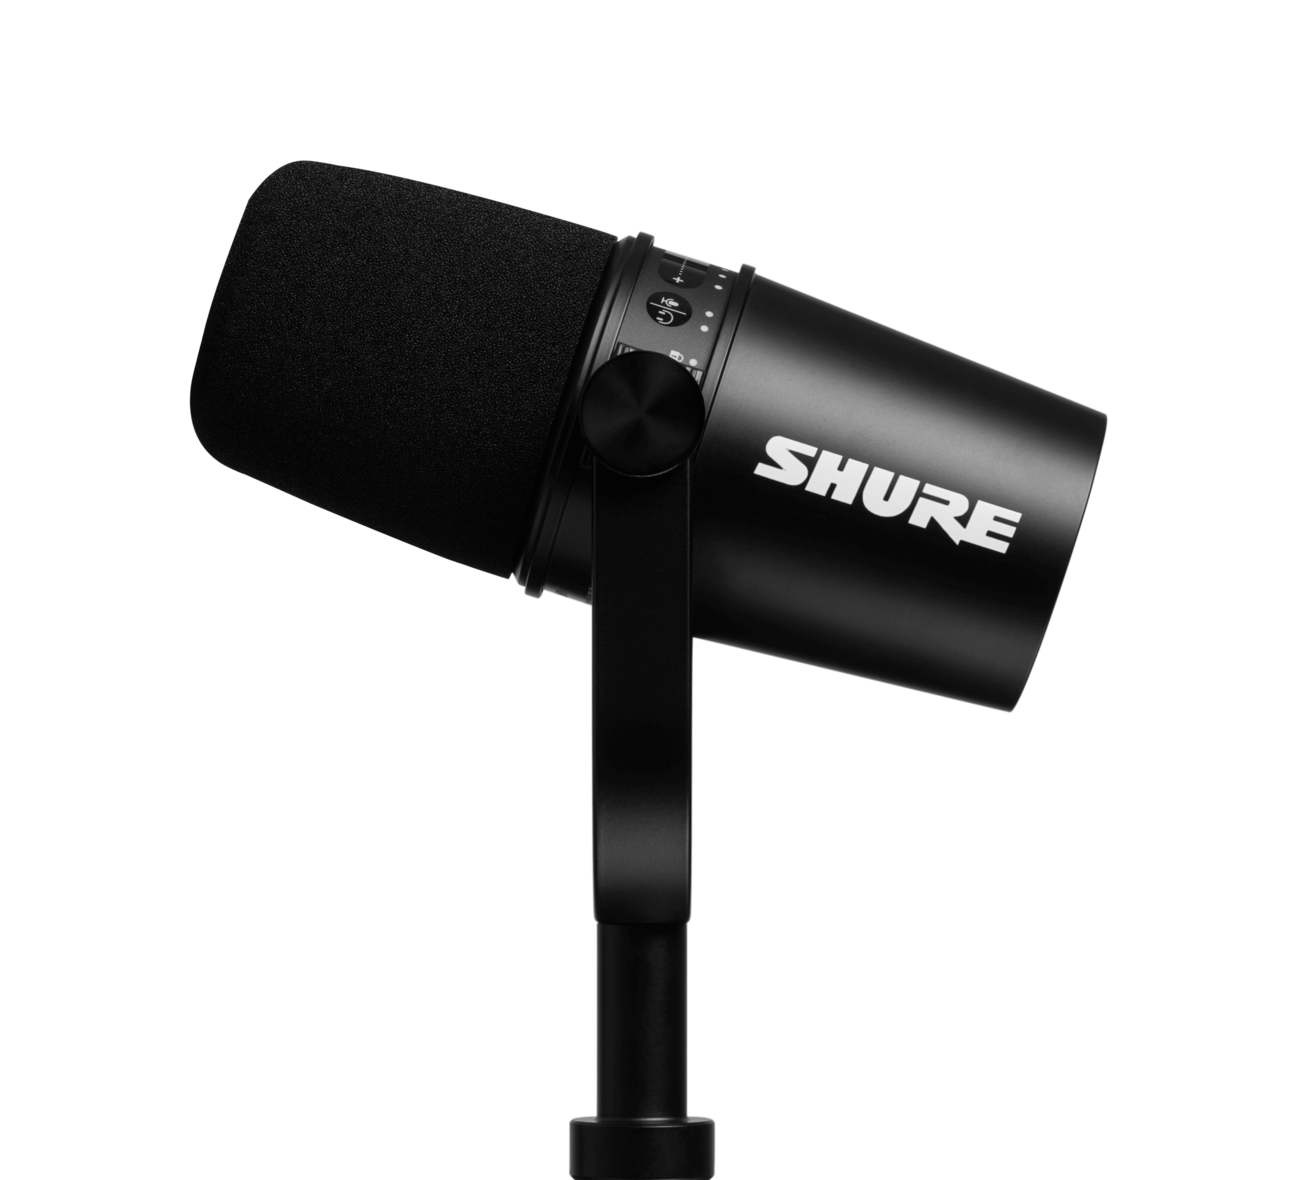 SHURE MV7-K BROADCAST MICROPHONE BLACK